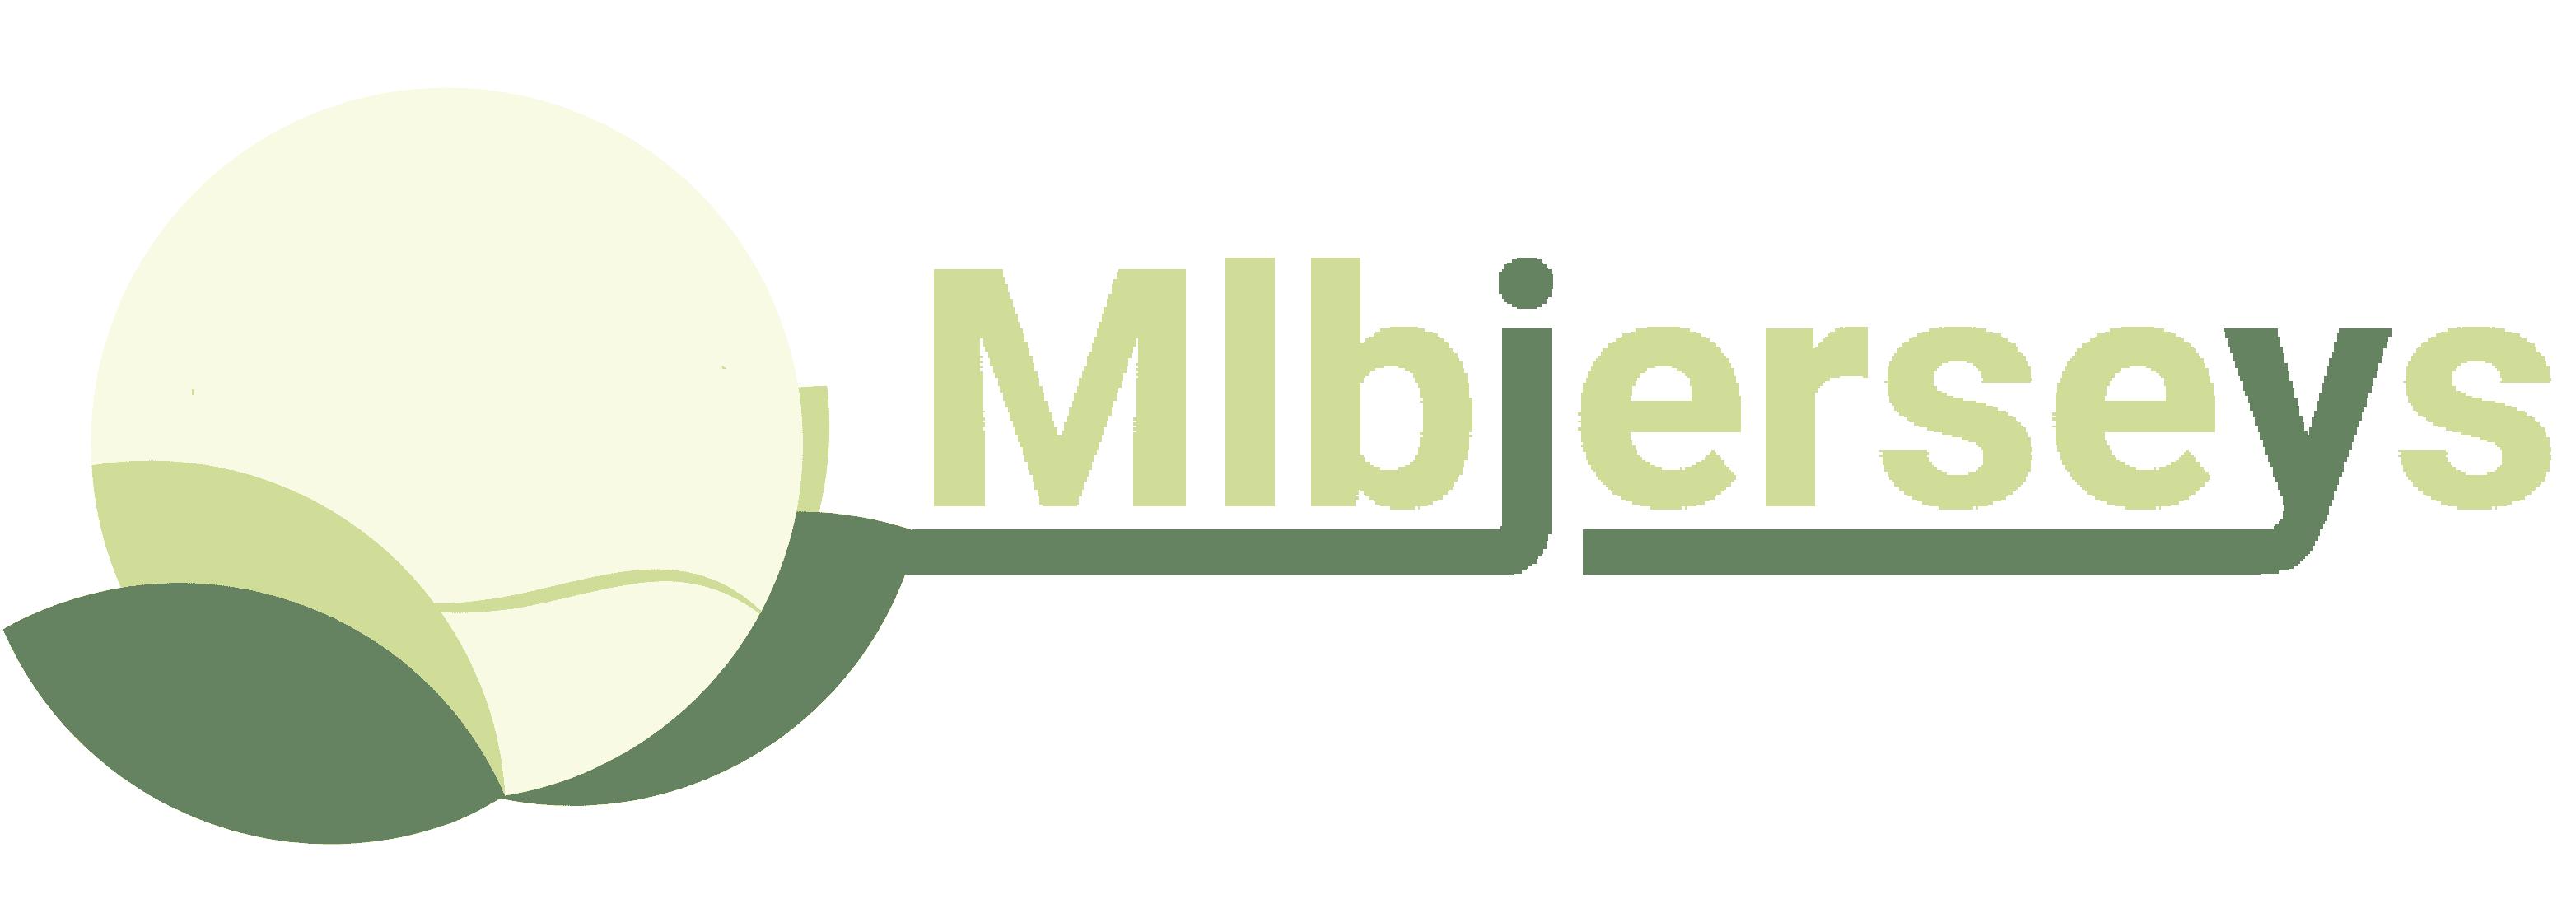 Mlbjerseys